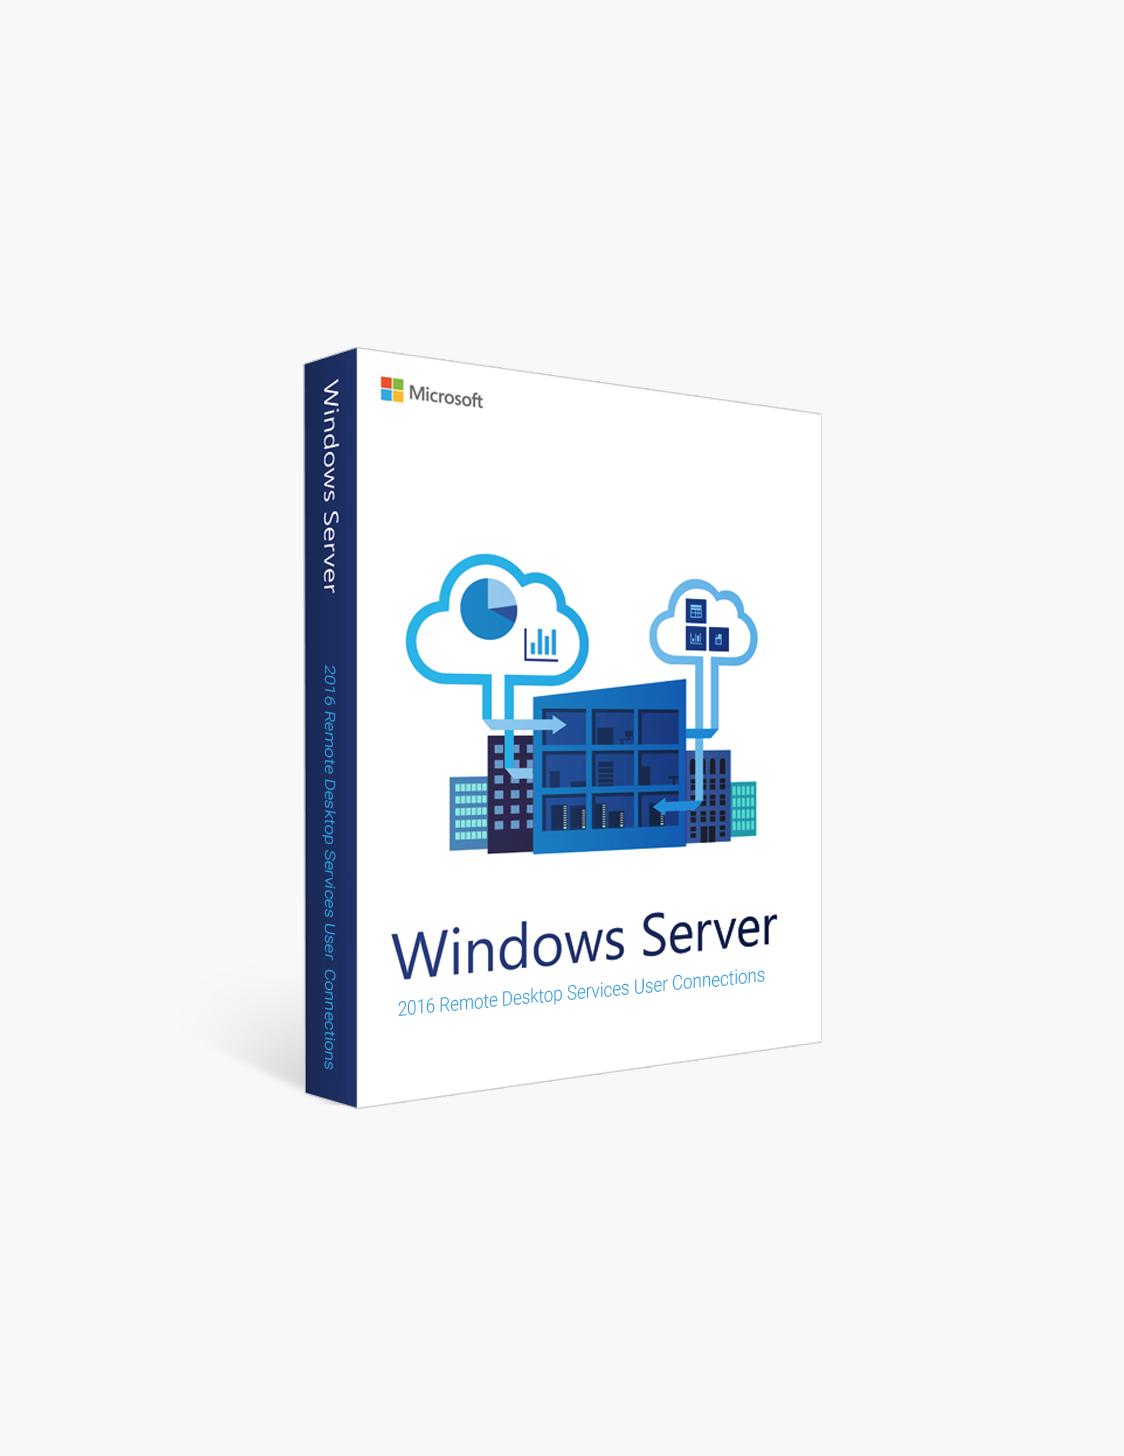 Windows Server 2016 Remote Desktop Services User Connections (20)